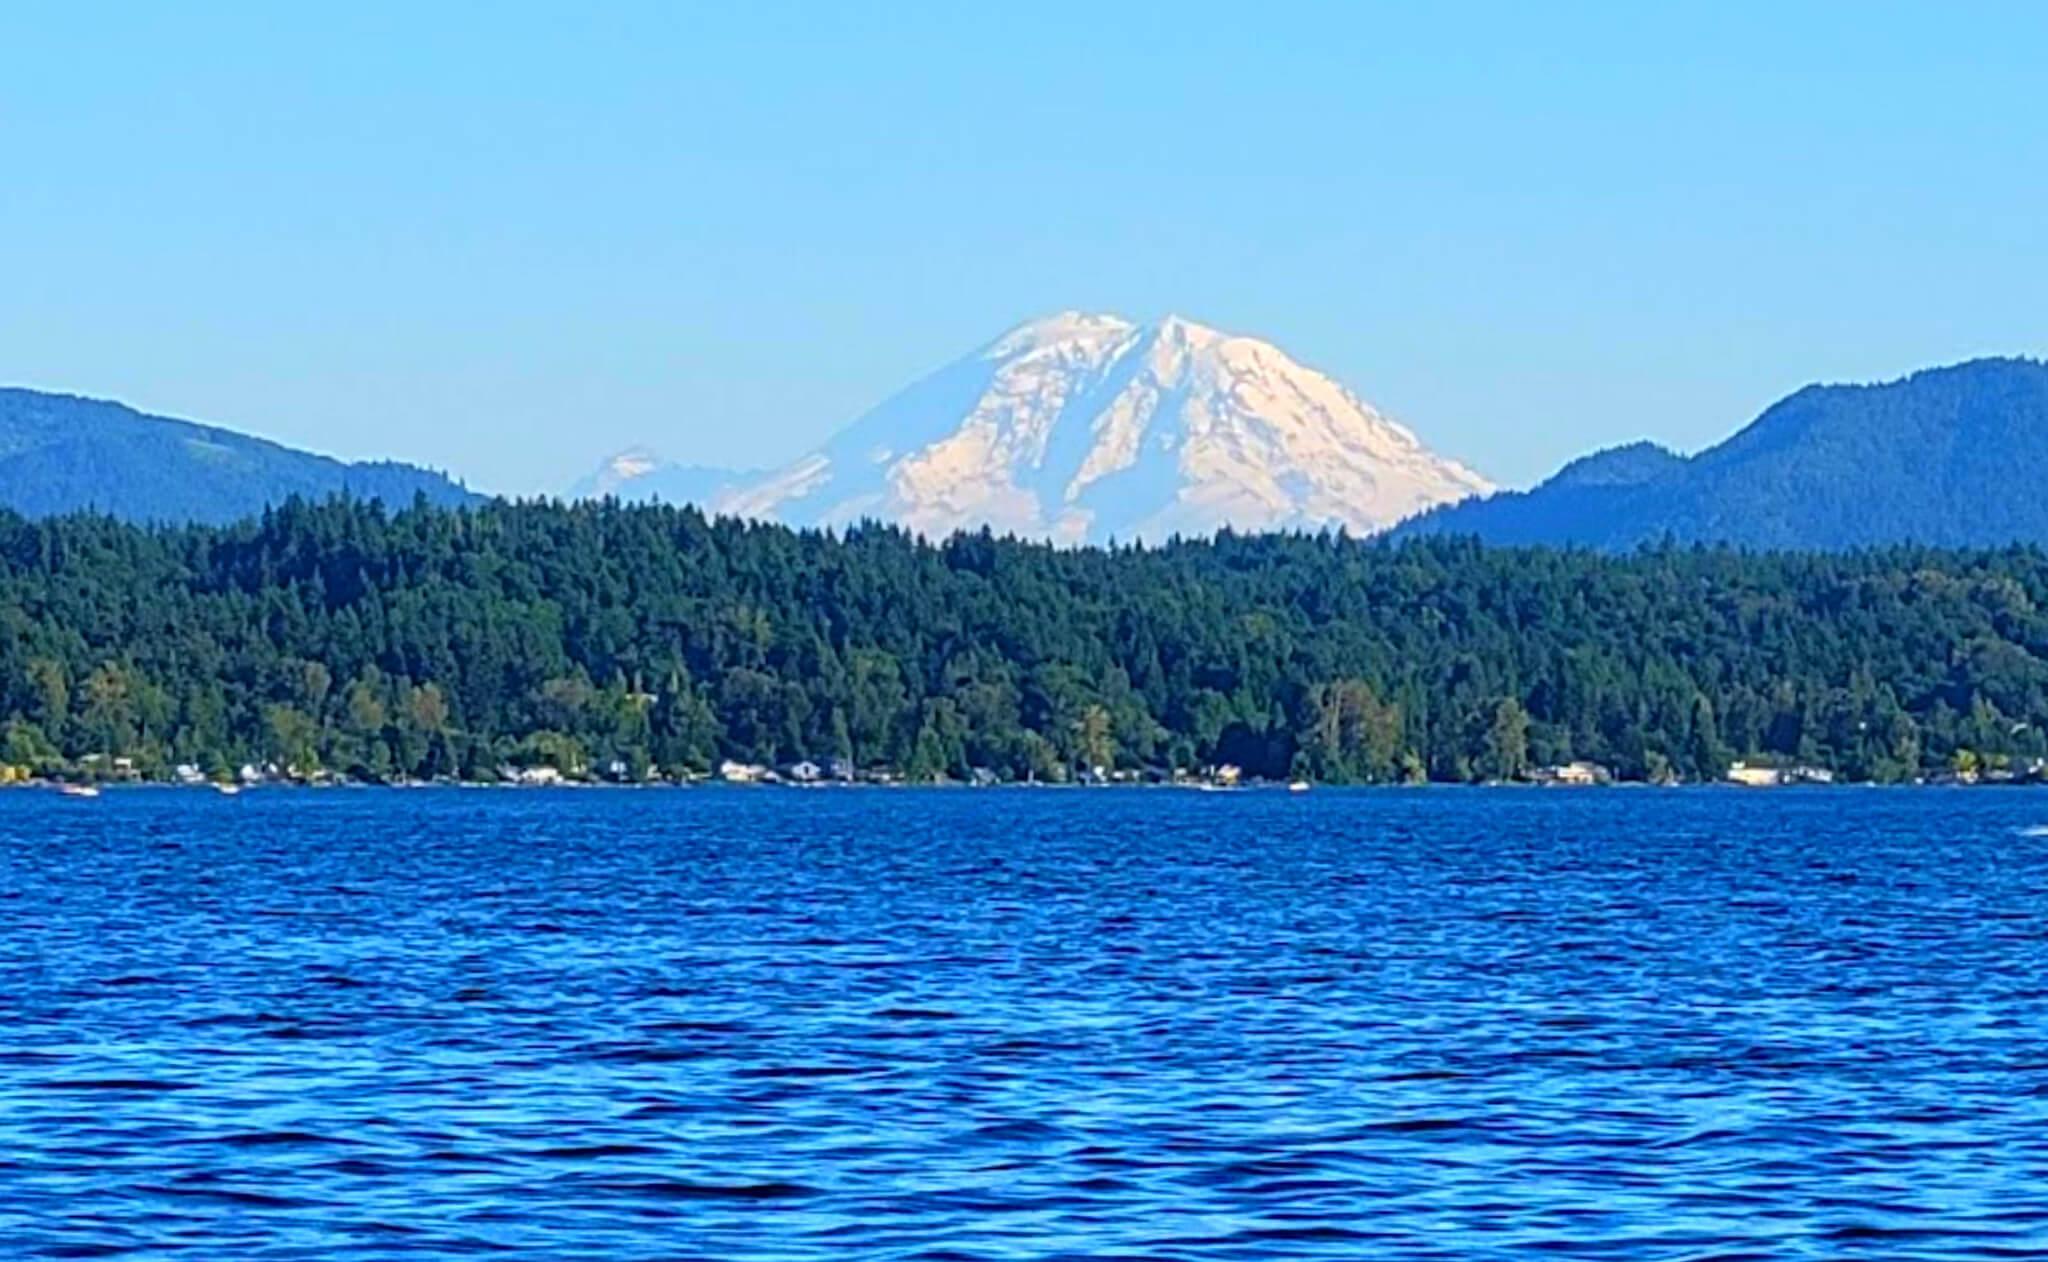 Sammamish-Lake-Fishing-Report-Guide-Washington-WA-02